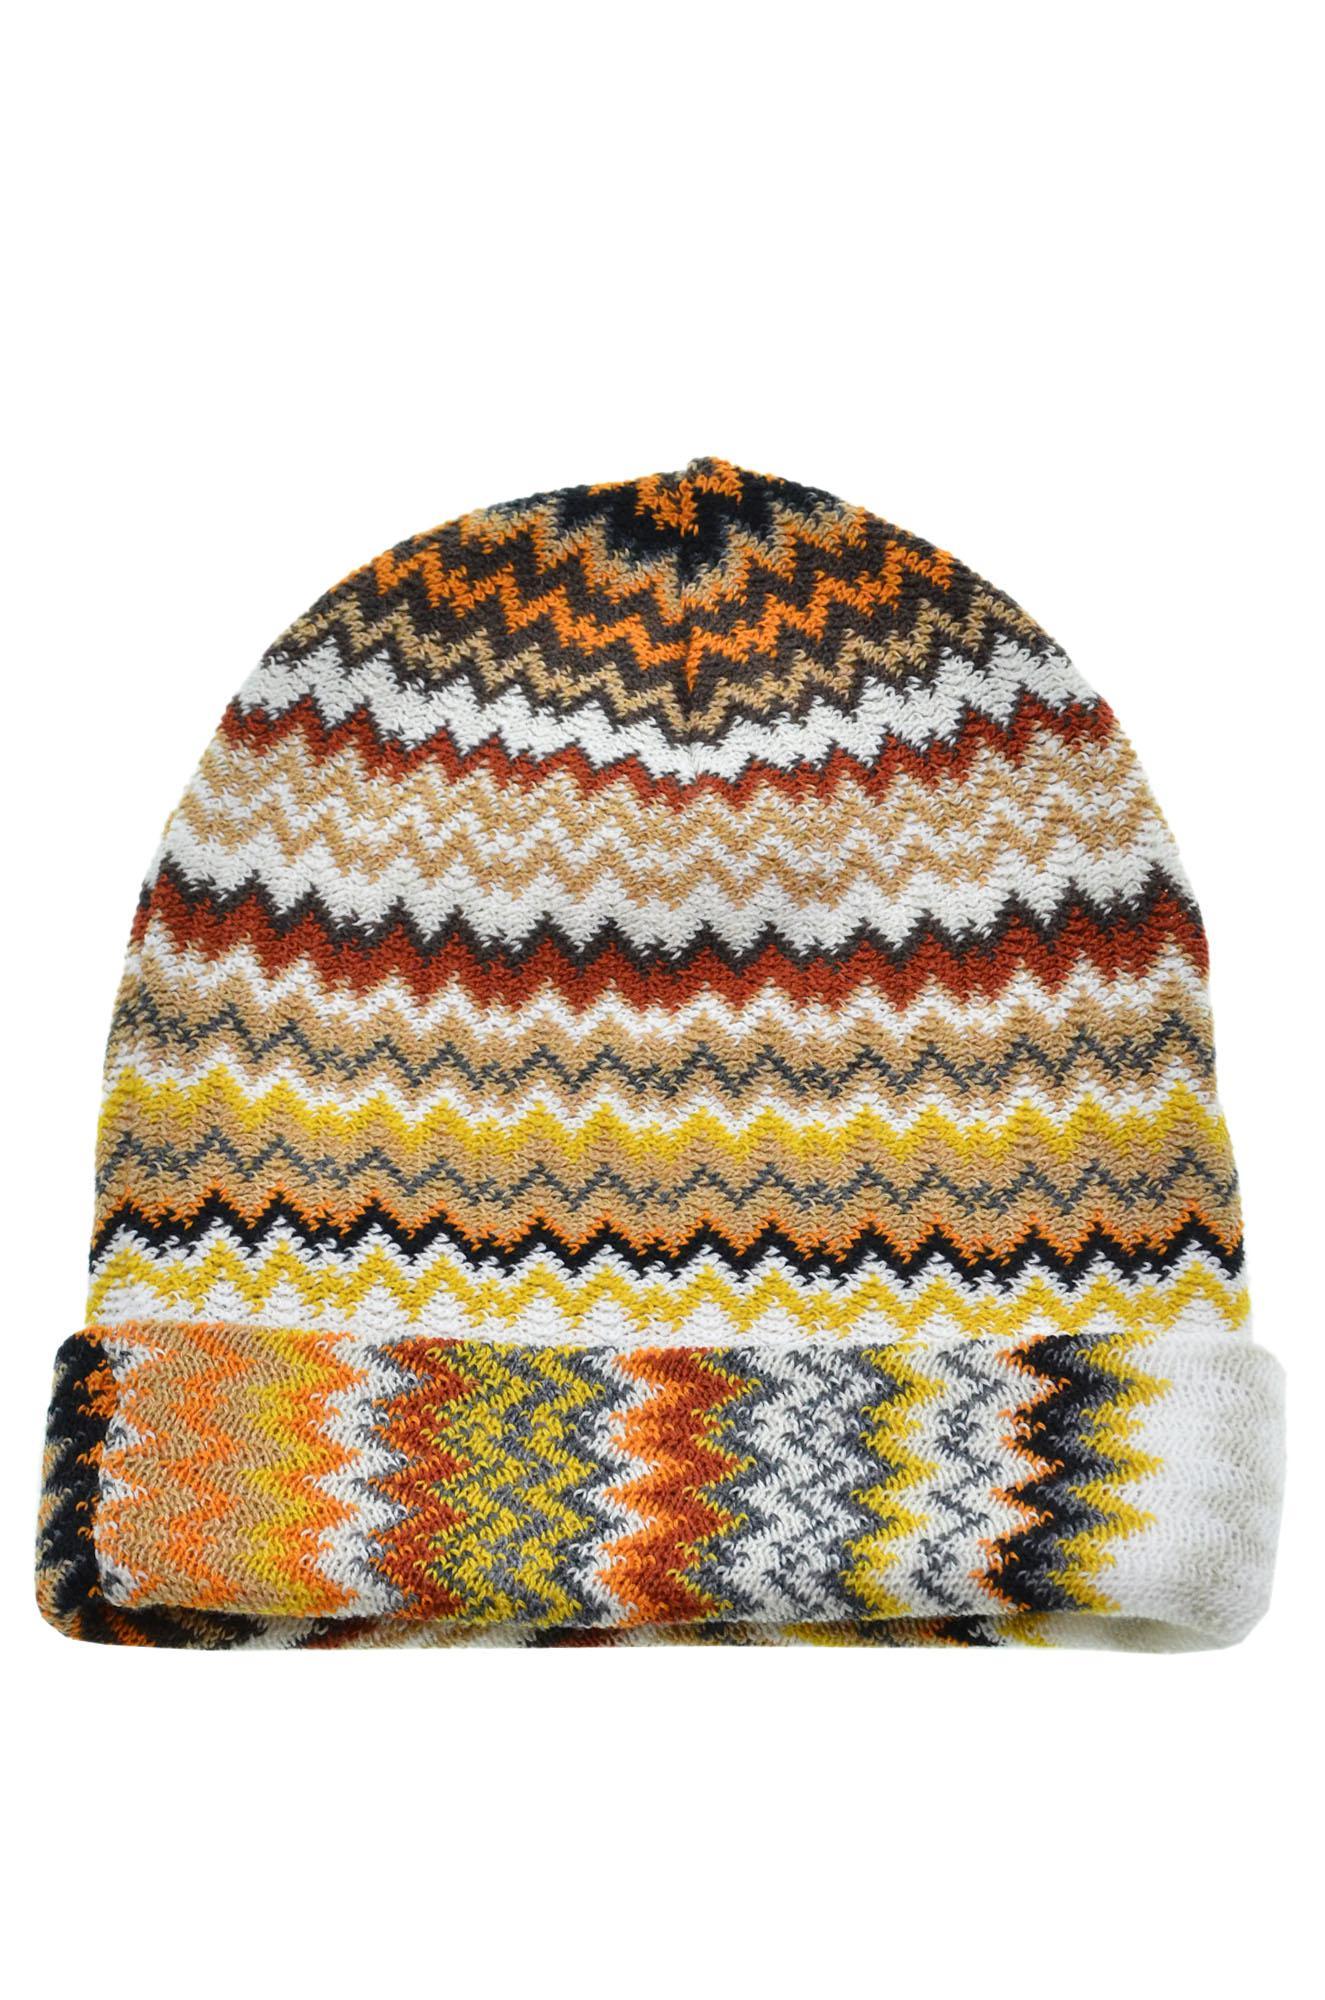 f4d8f75bec3 Missoni - Multicolor Knitted Beanie - Lyst. View fullscreen